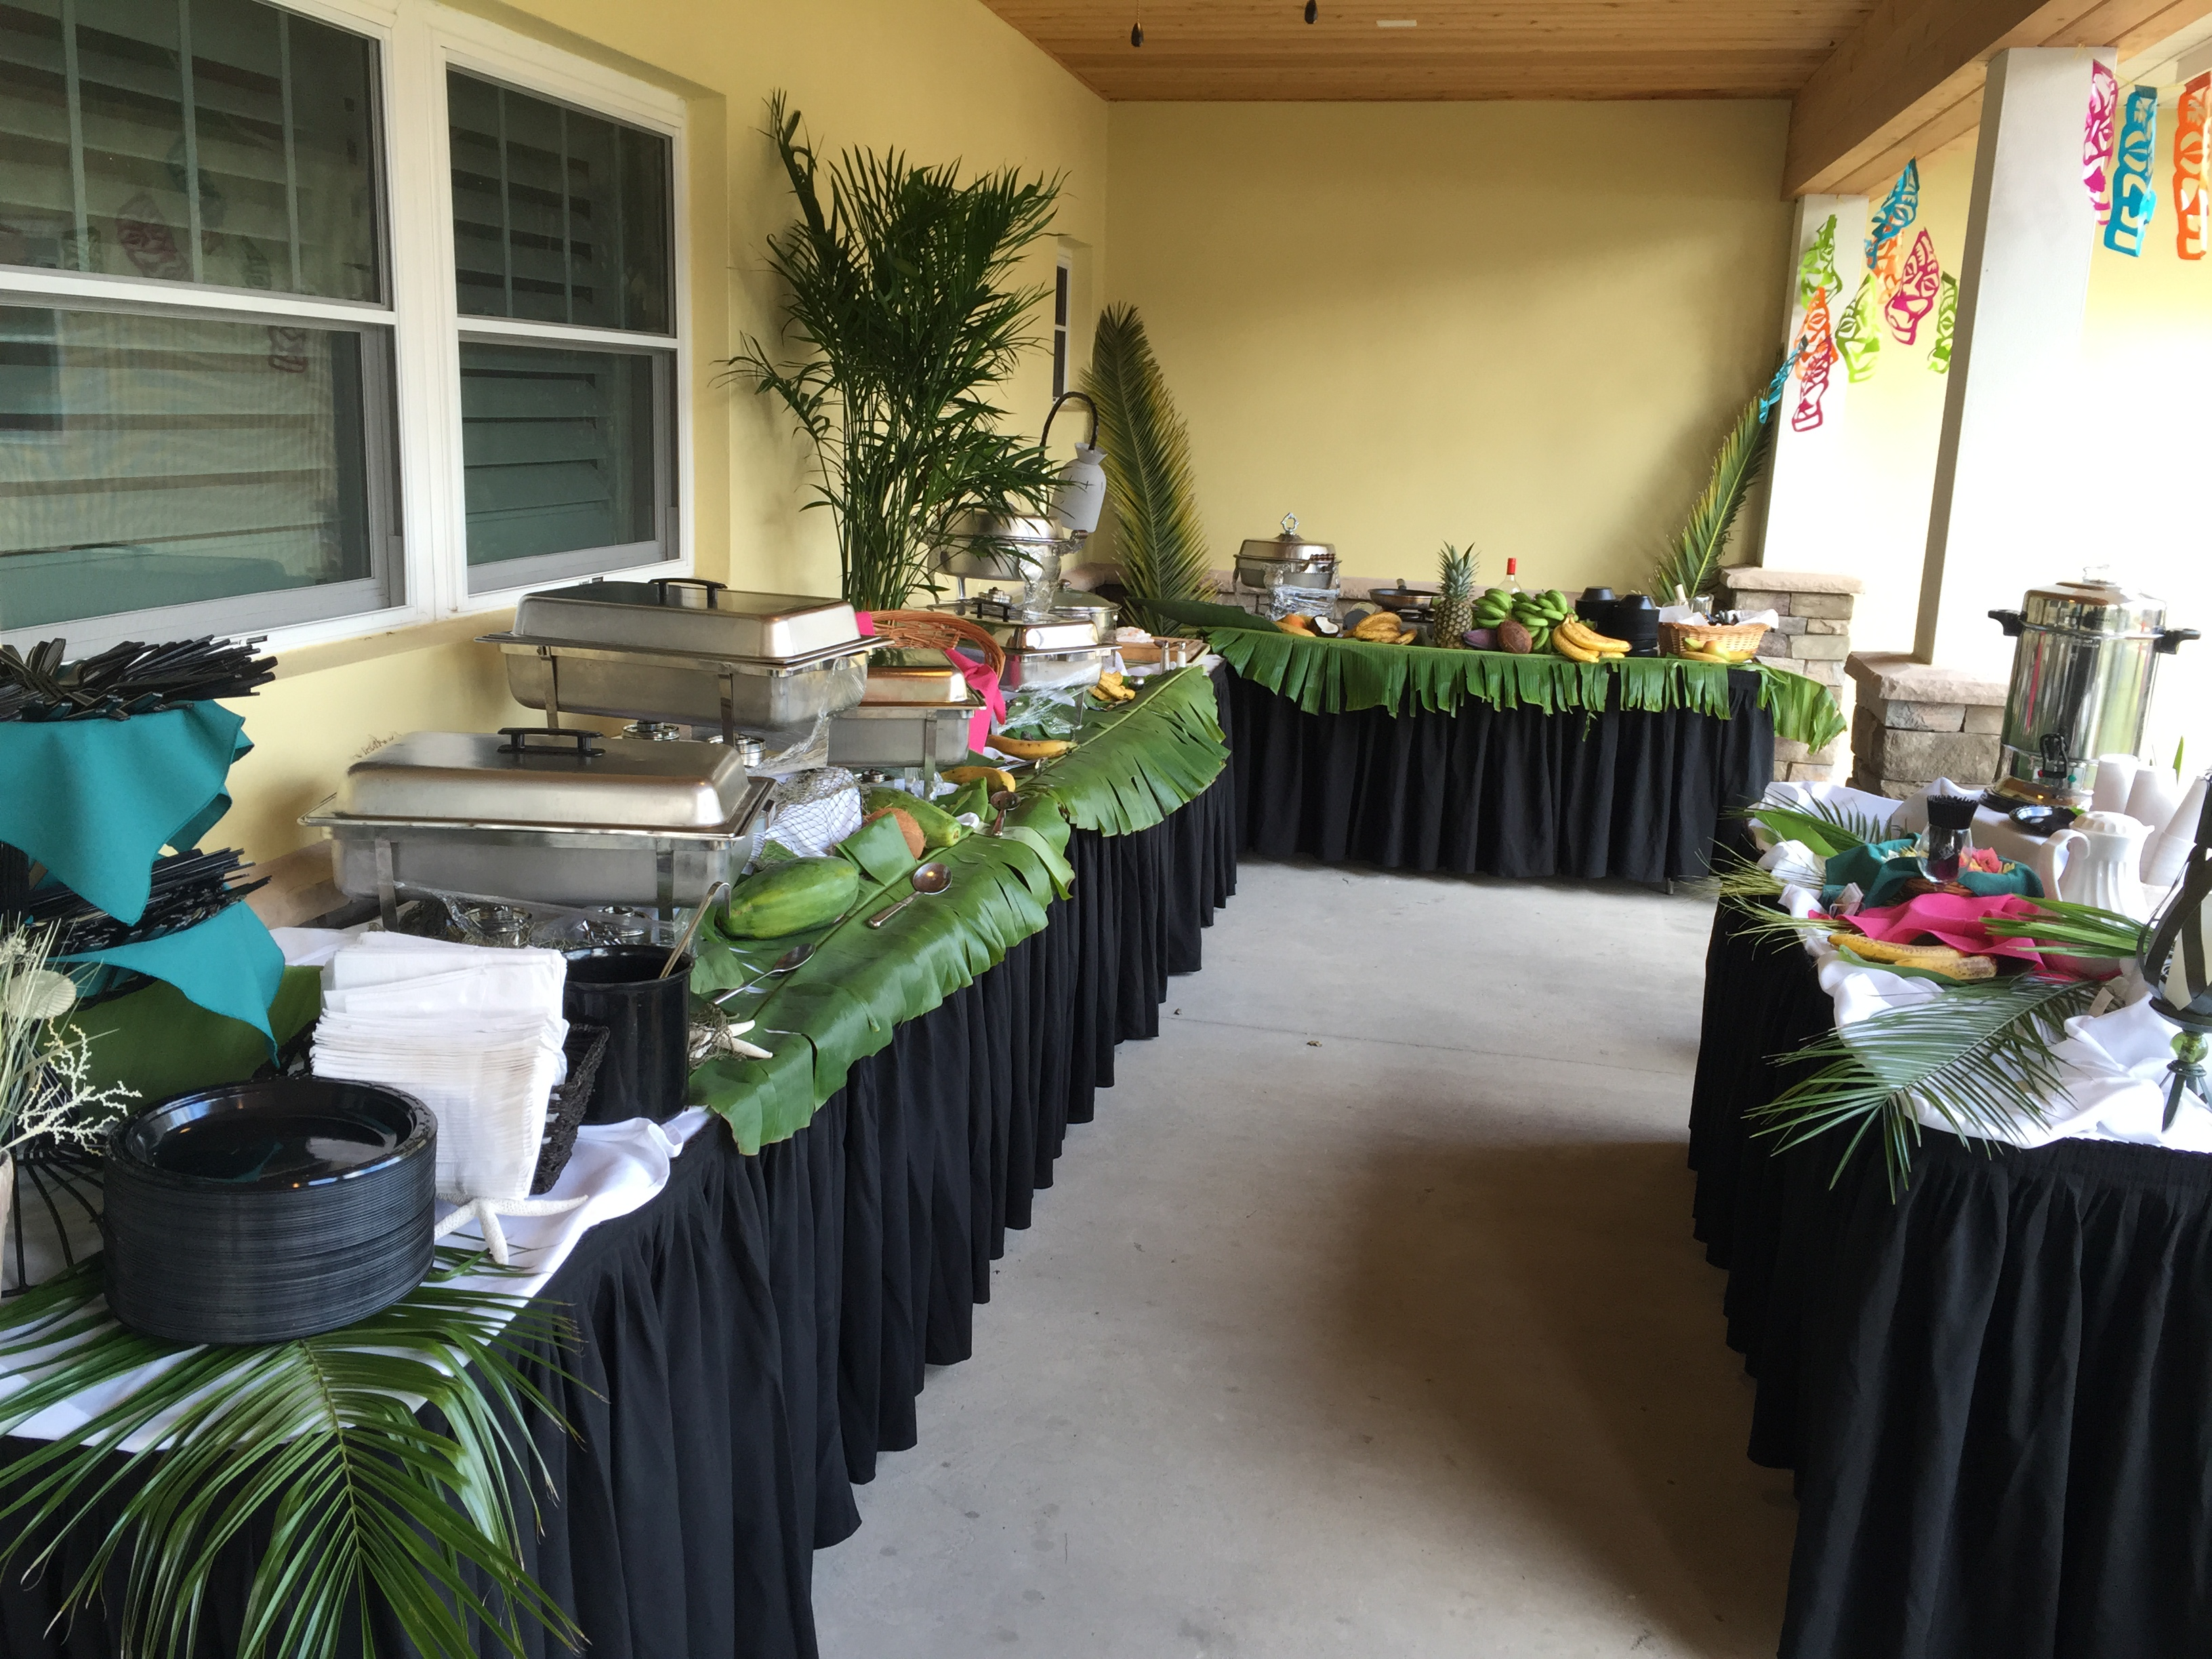 Buffet Style Food Layout